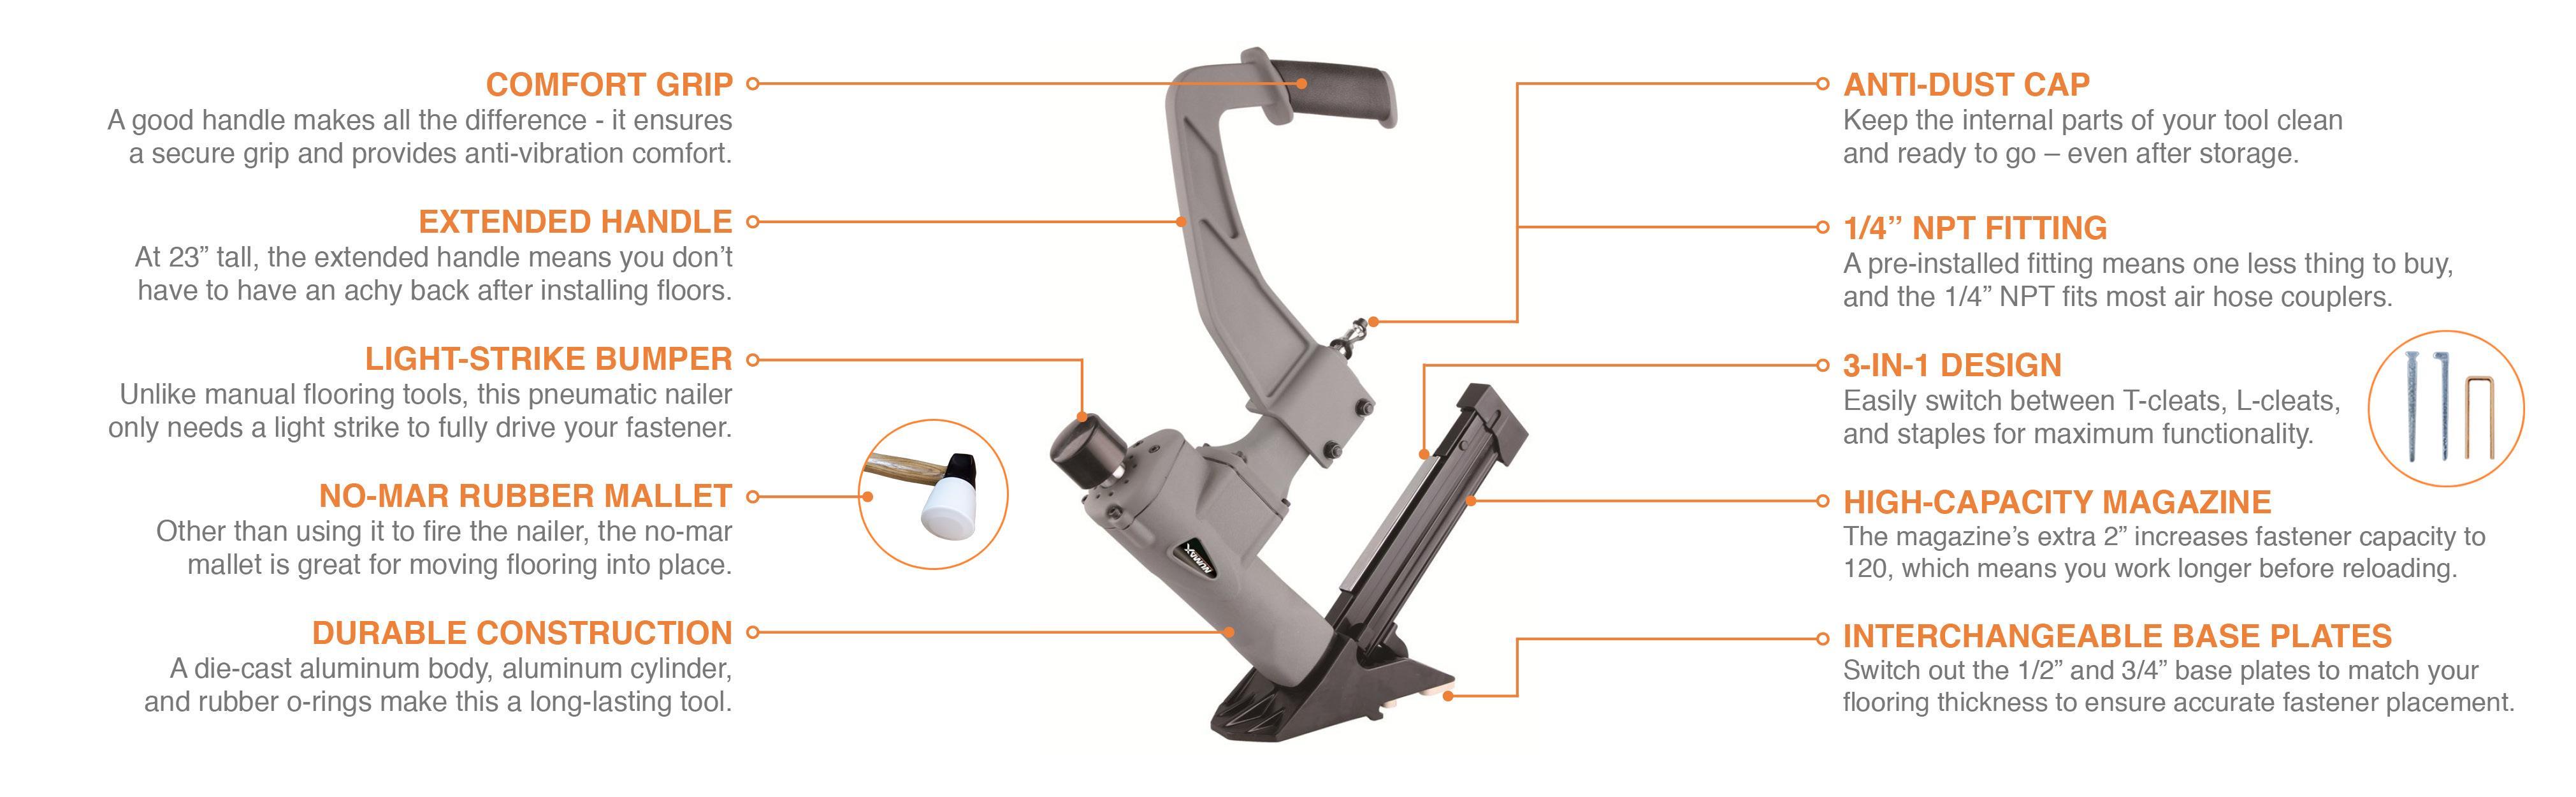 Numax Sfl618 3 In 1 Pneumatic Flooring Stapler Nailer With